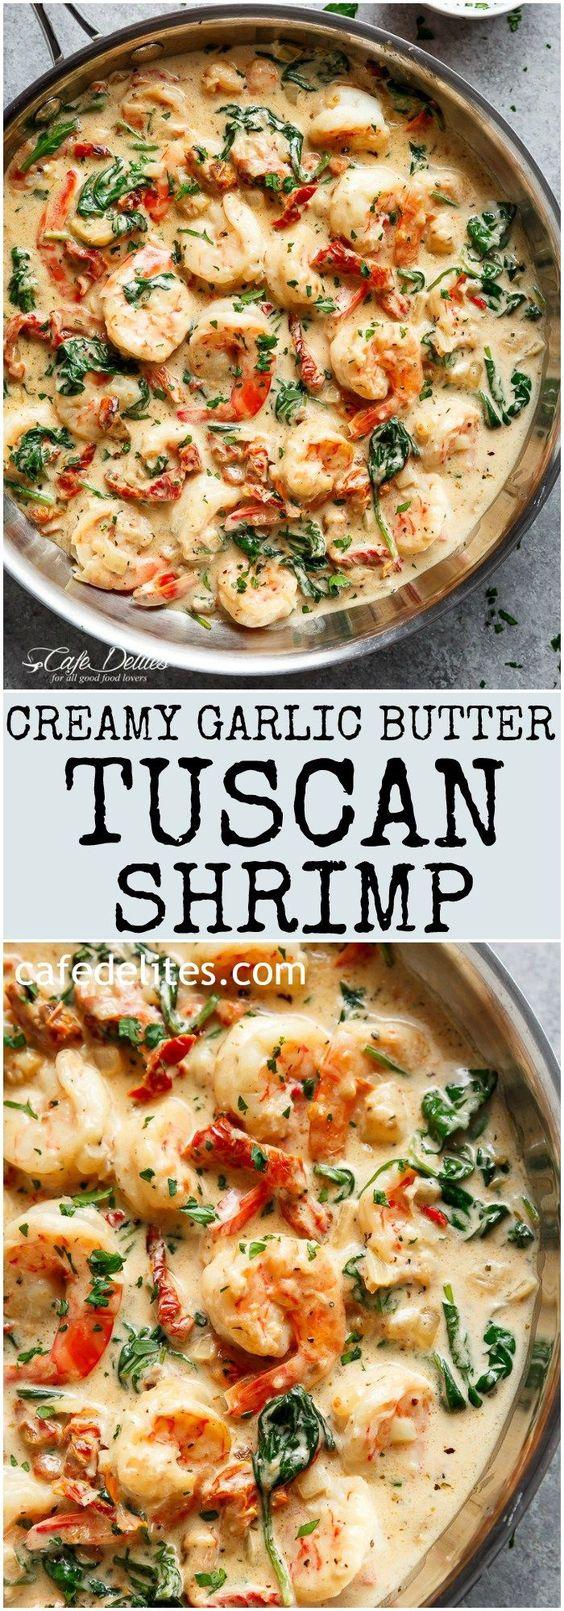 Creamy Garlic Butter Tuscan Shrimp Creamy Garlic Butter Tuscan Shrimp